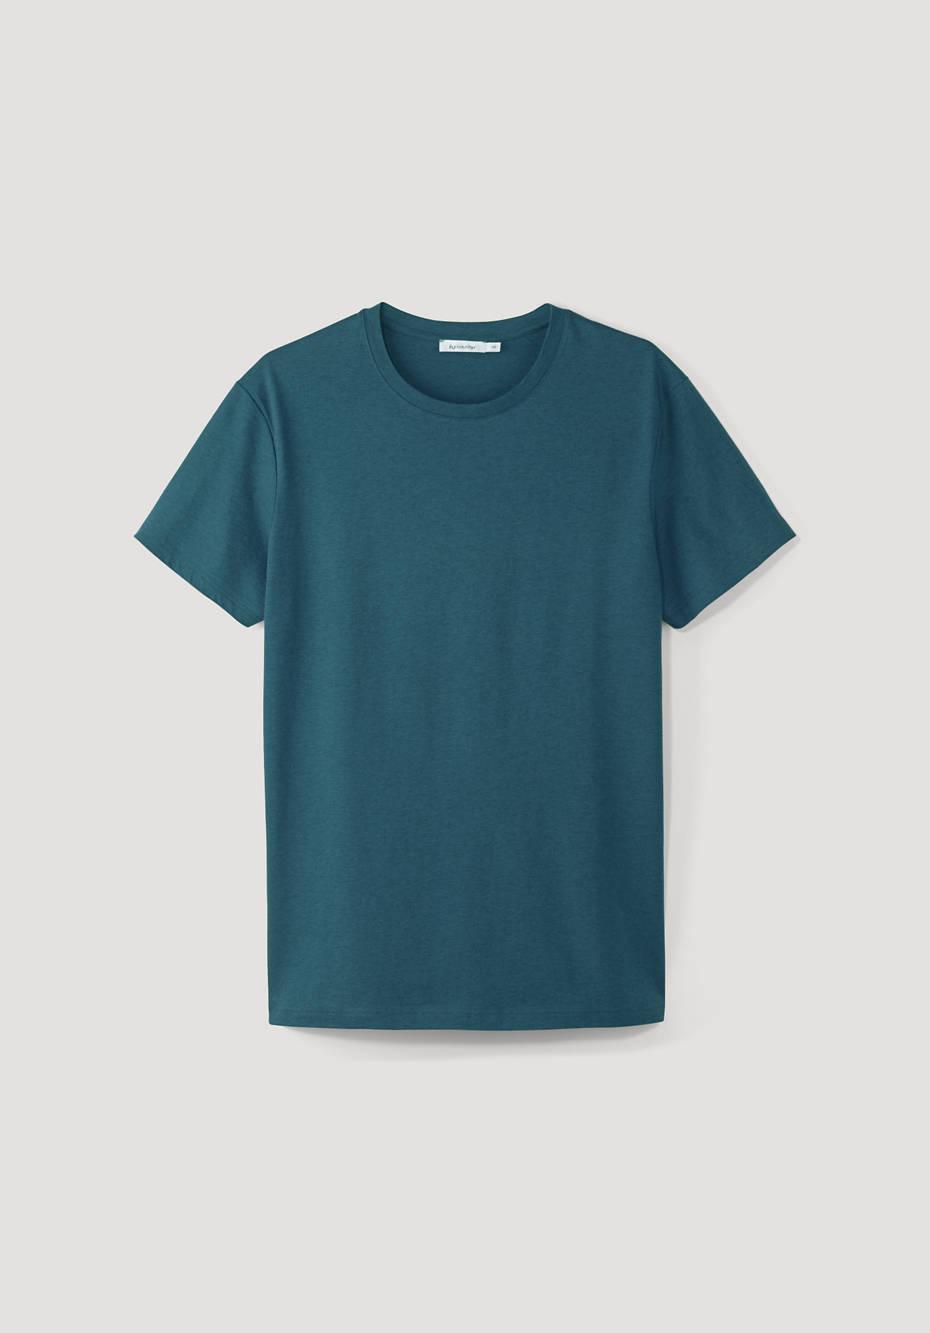 Organic cotton t-shirt with virgin wool